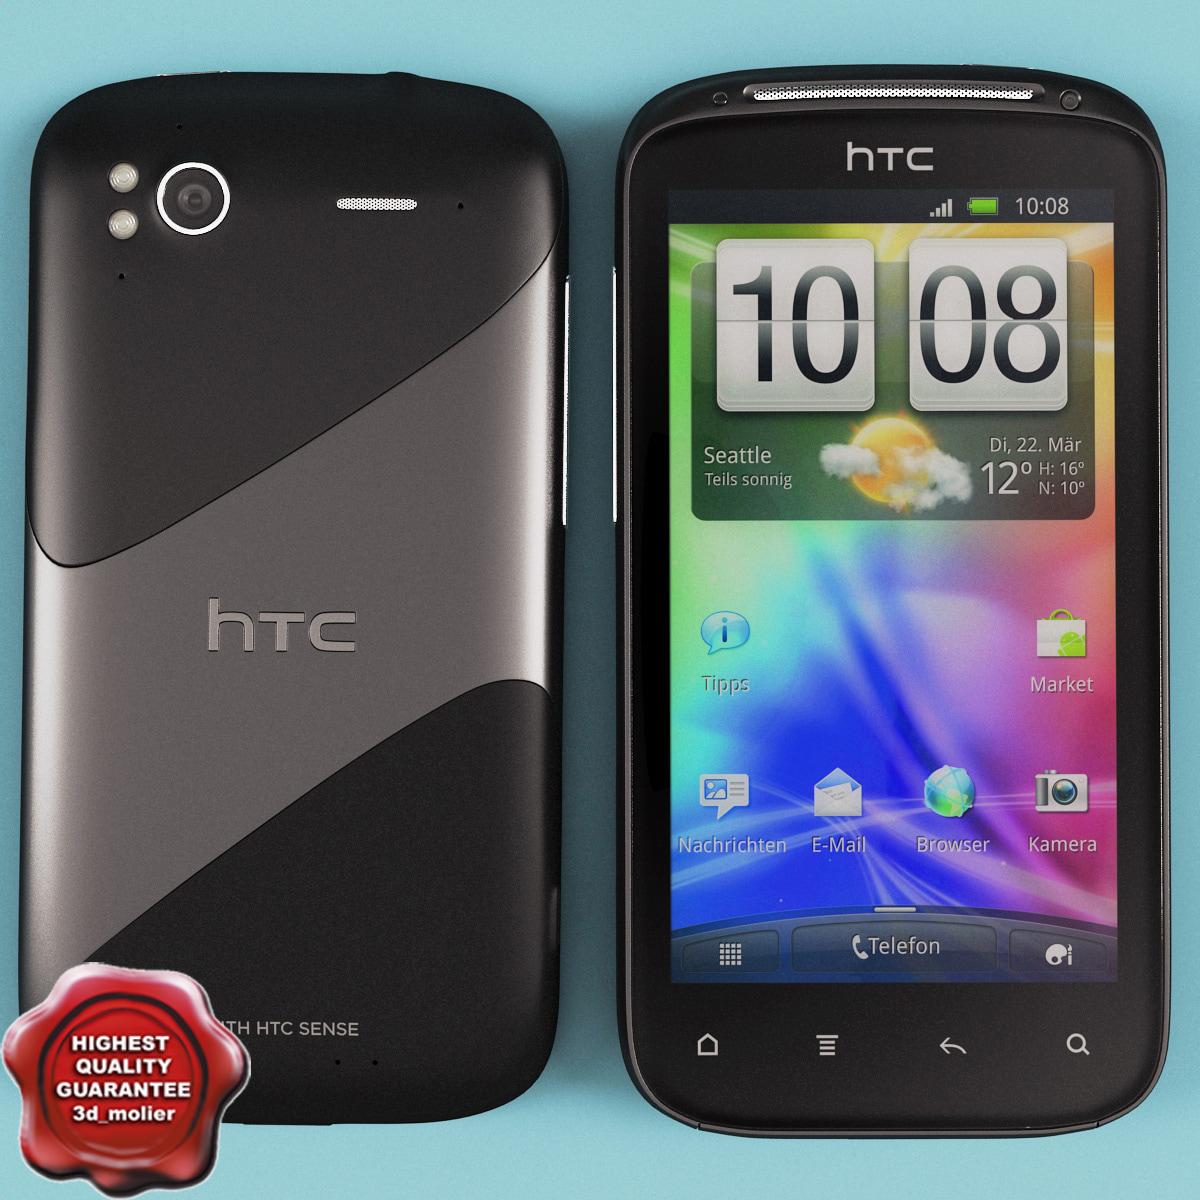 HTC_Sensation_00.jpg